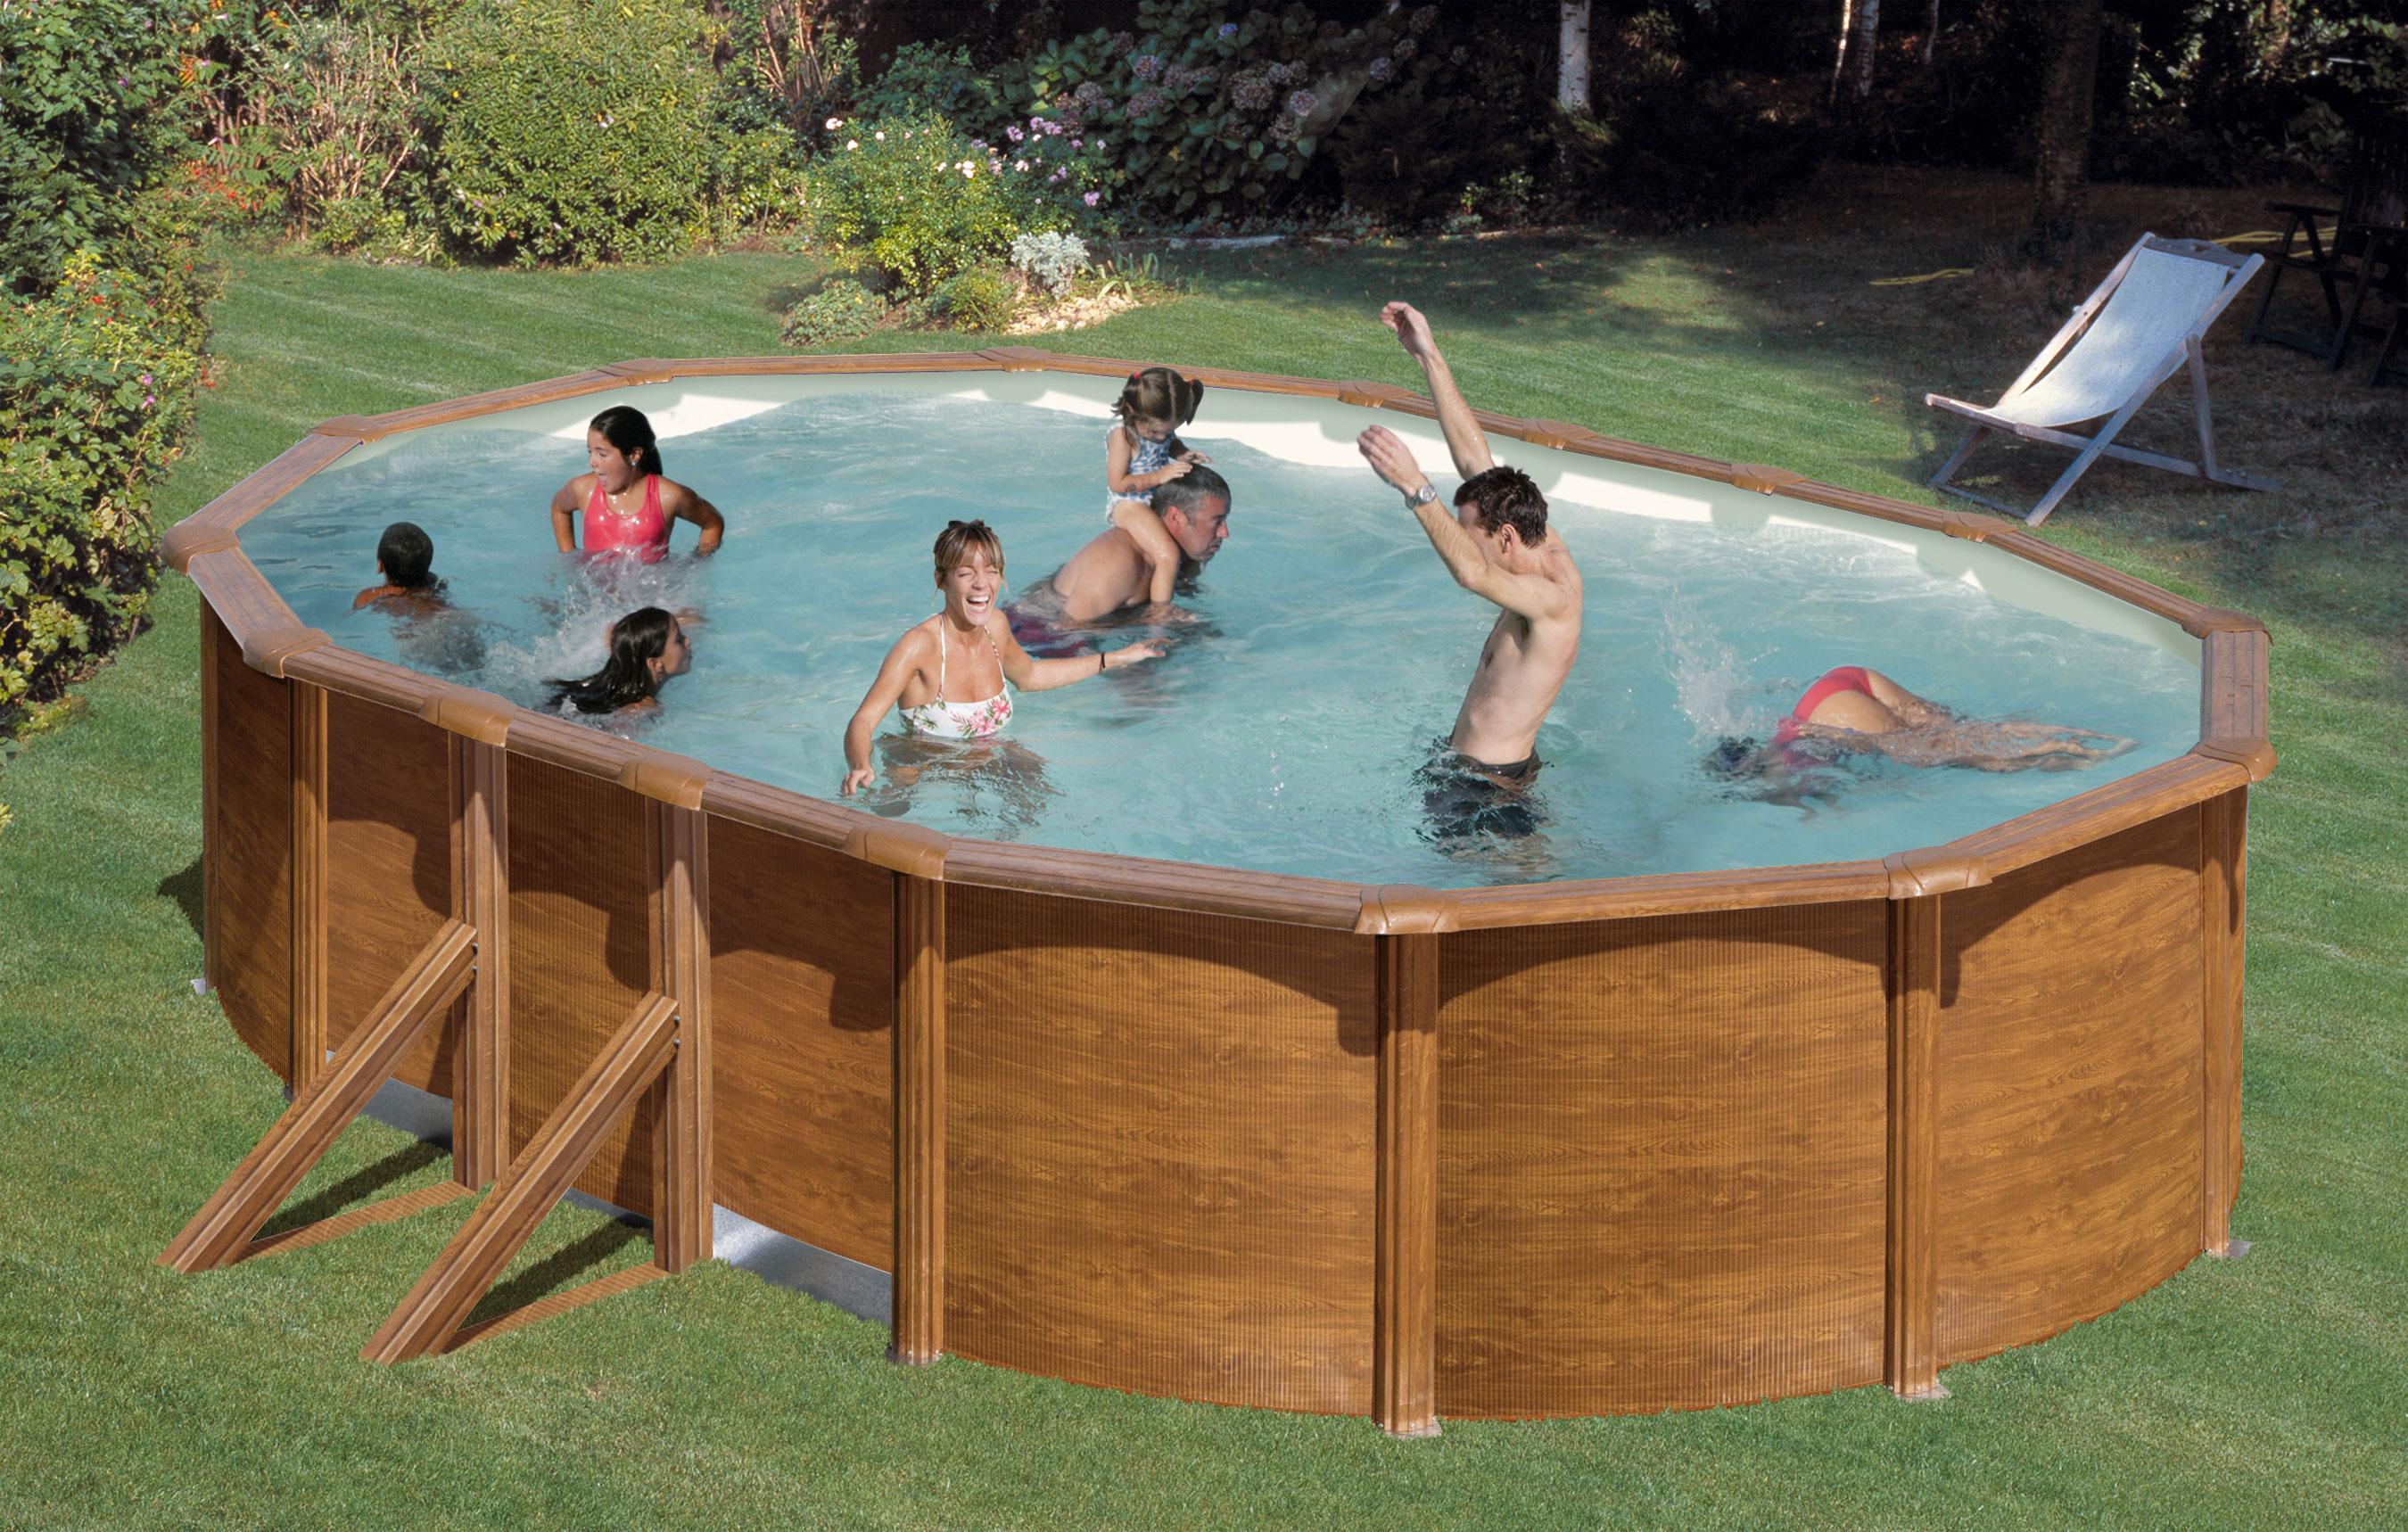 Pool / Stahlwandpool Set myPool Feeling Holzoptik oval 610x375x120cm Bild 1